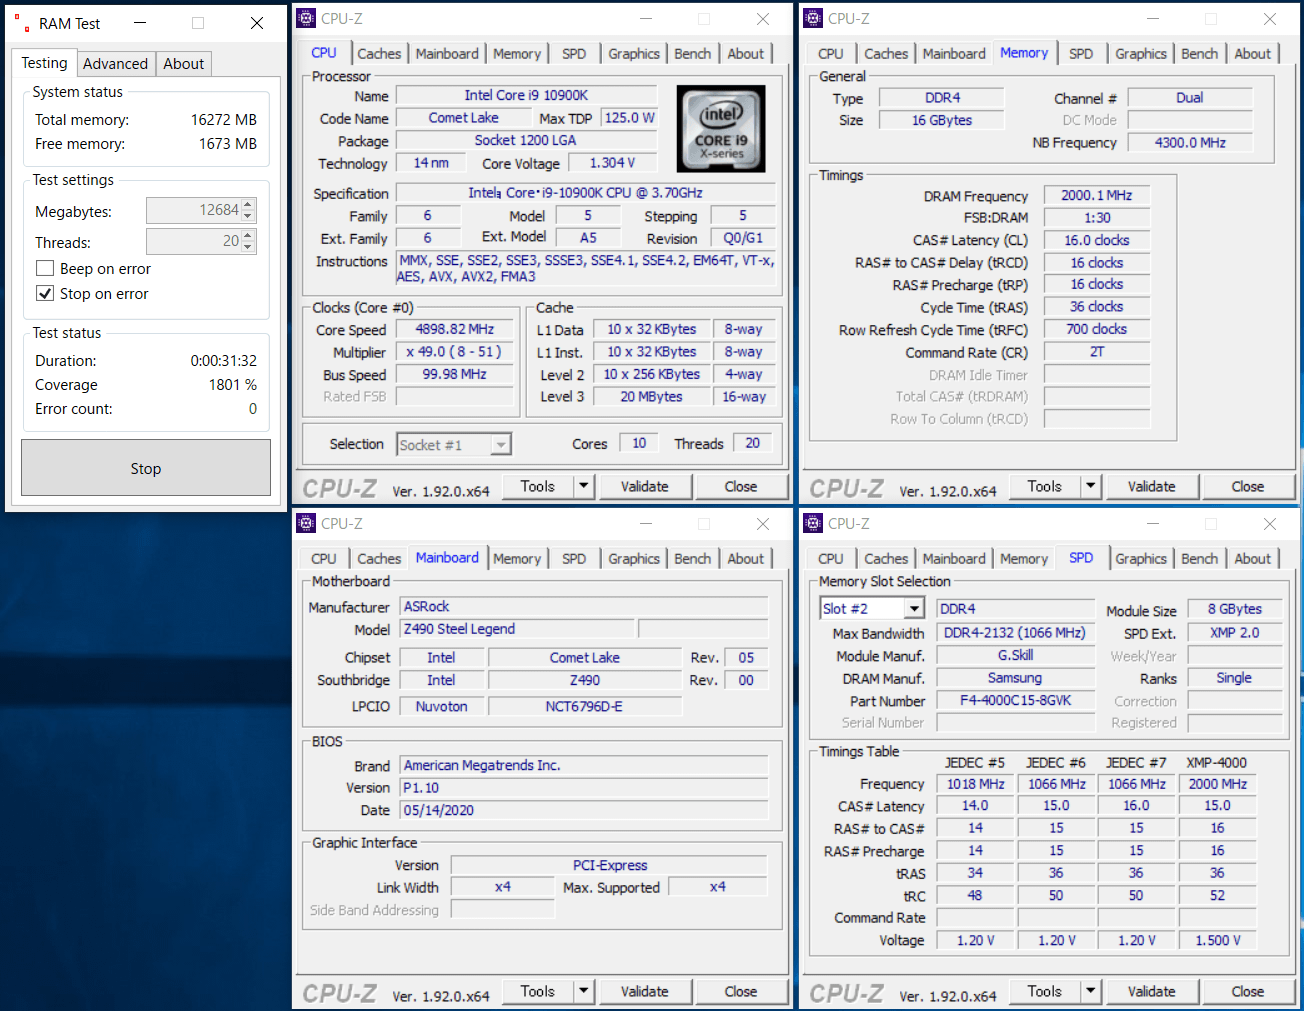 ASRock Z490 Steel Legend_Mem-OC_8x2_4000MHz_CL16